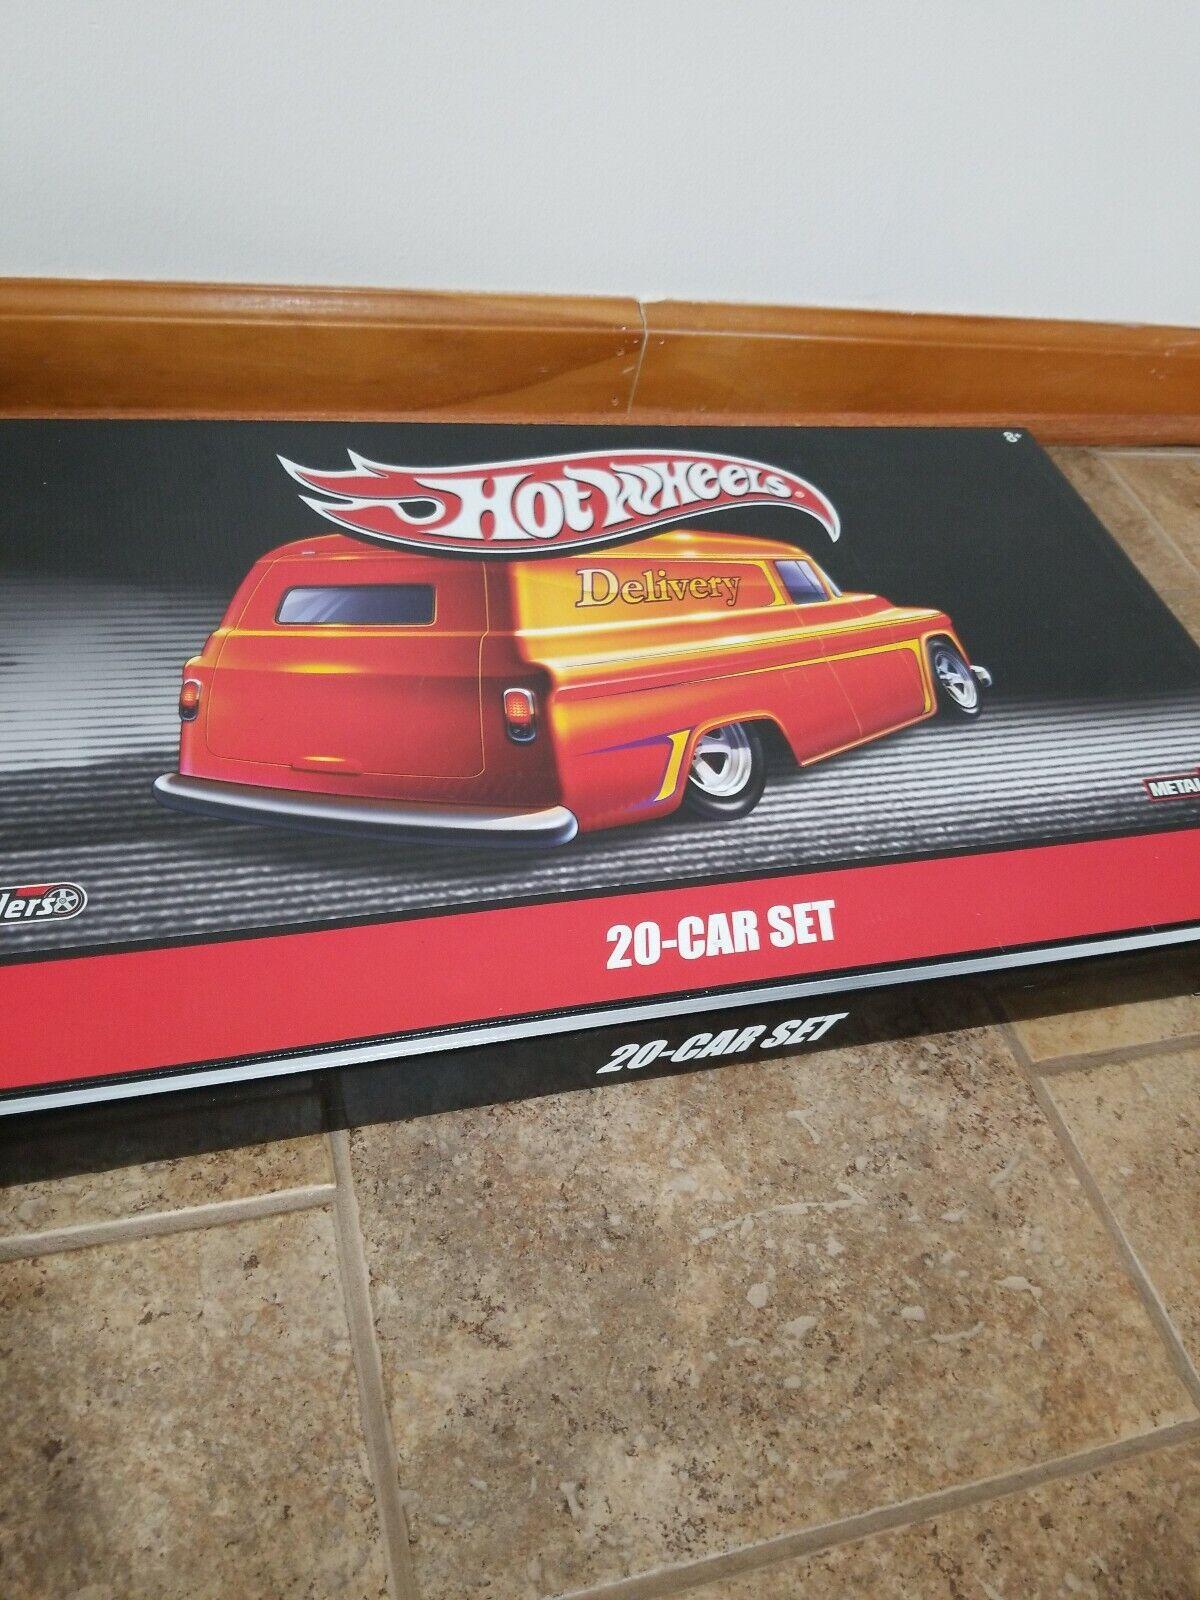 Hot Hot Hot Wheels real riders 29 car set Delivery 0da046